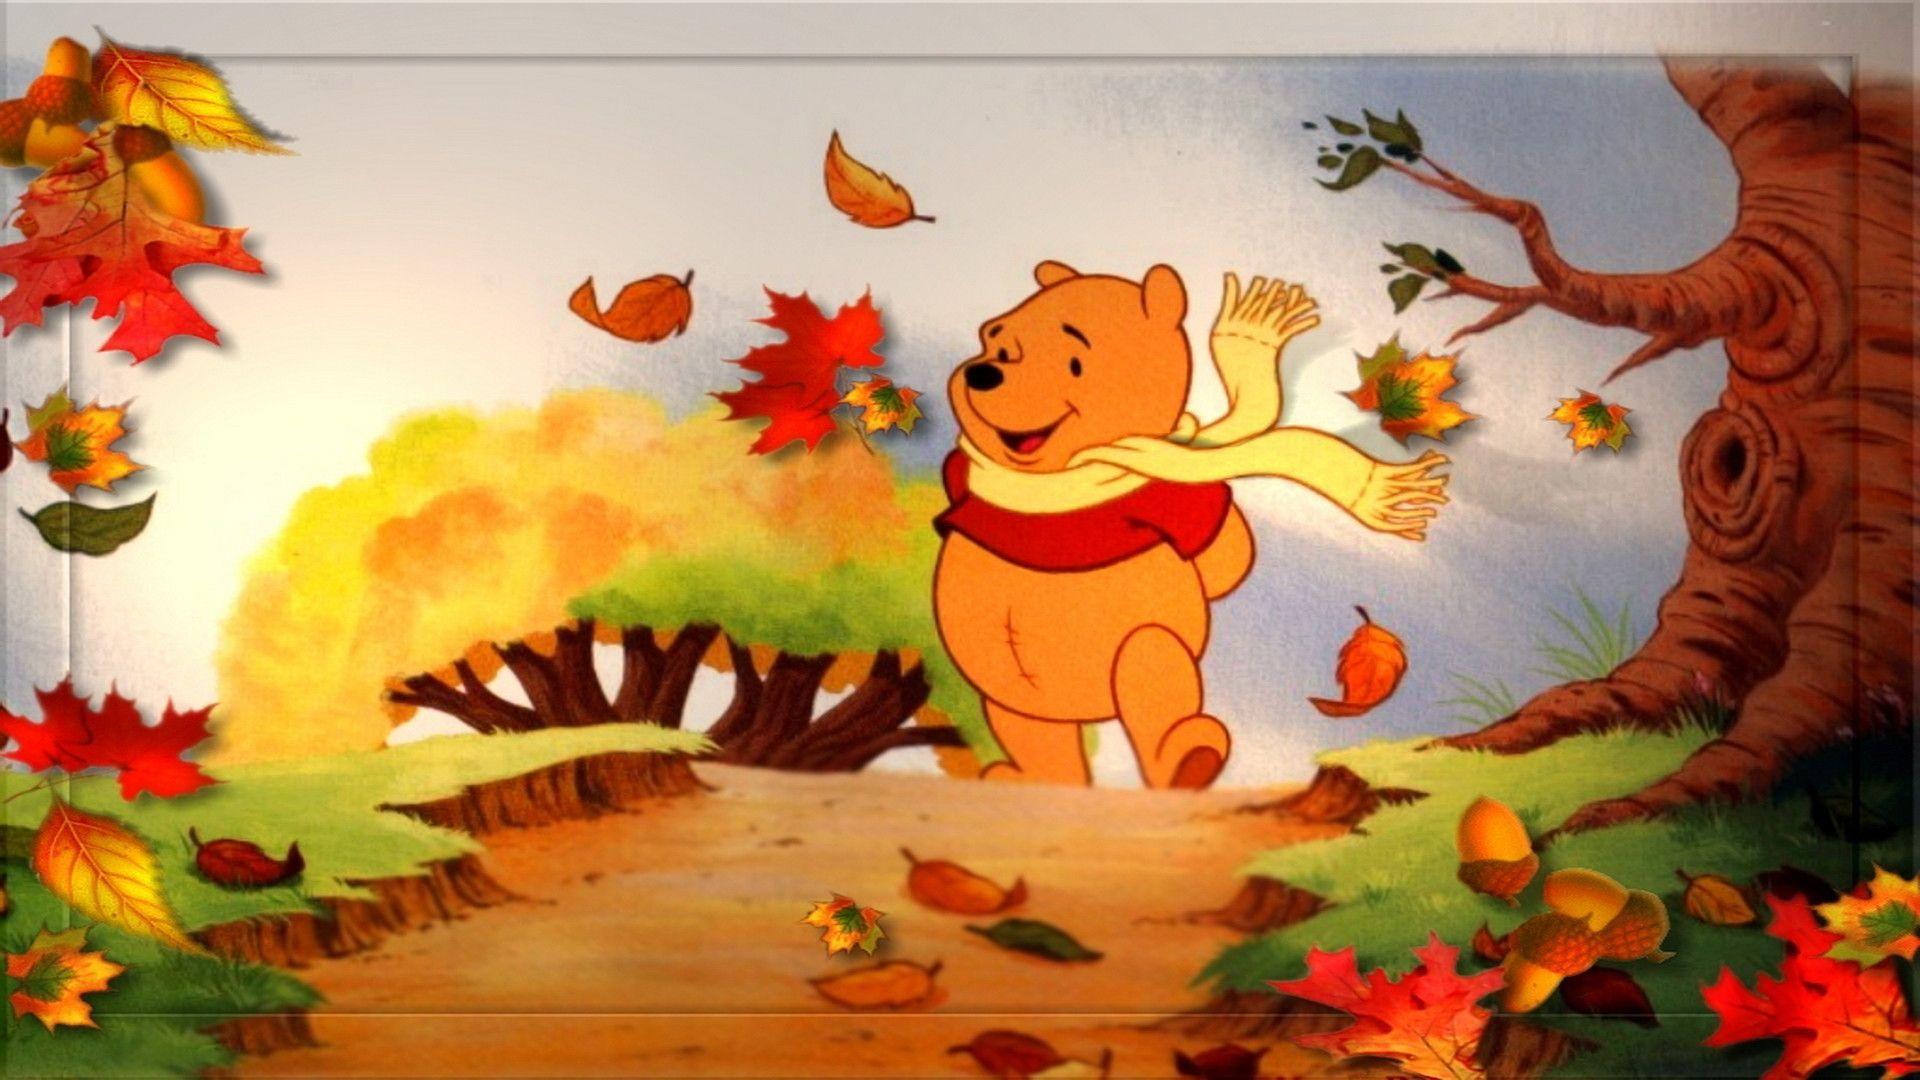 Disney Fall Wallpapers Top Free Disney Fall Backgrounds Wallpaperaccess